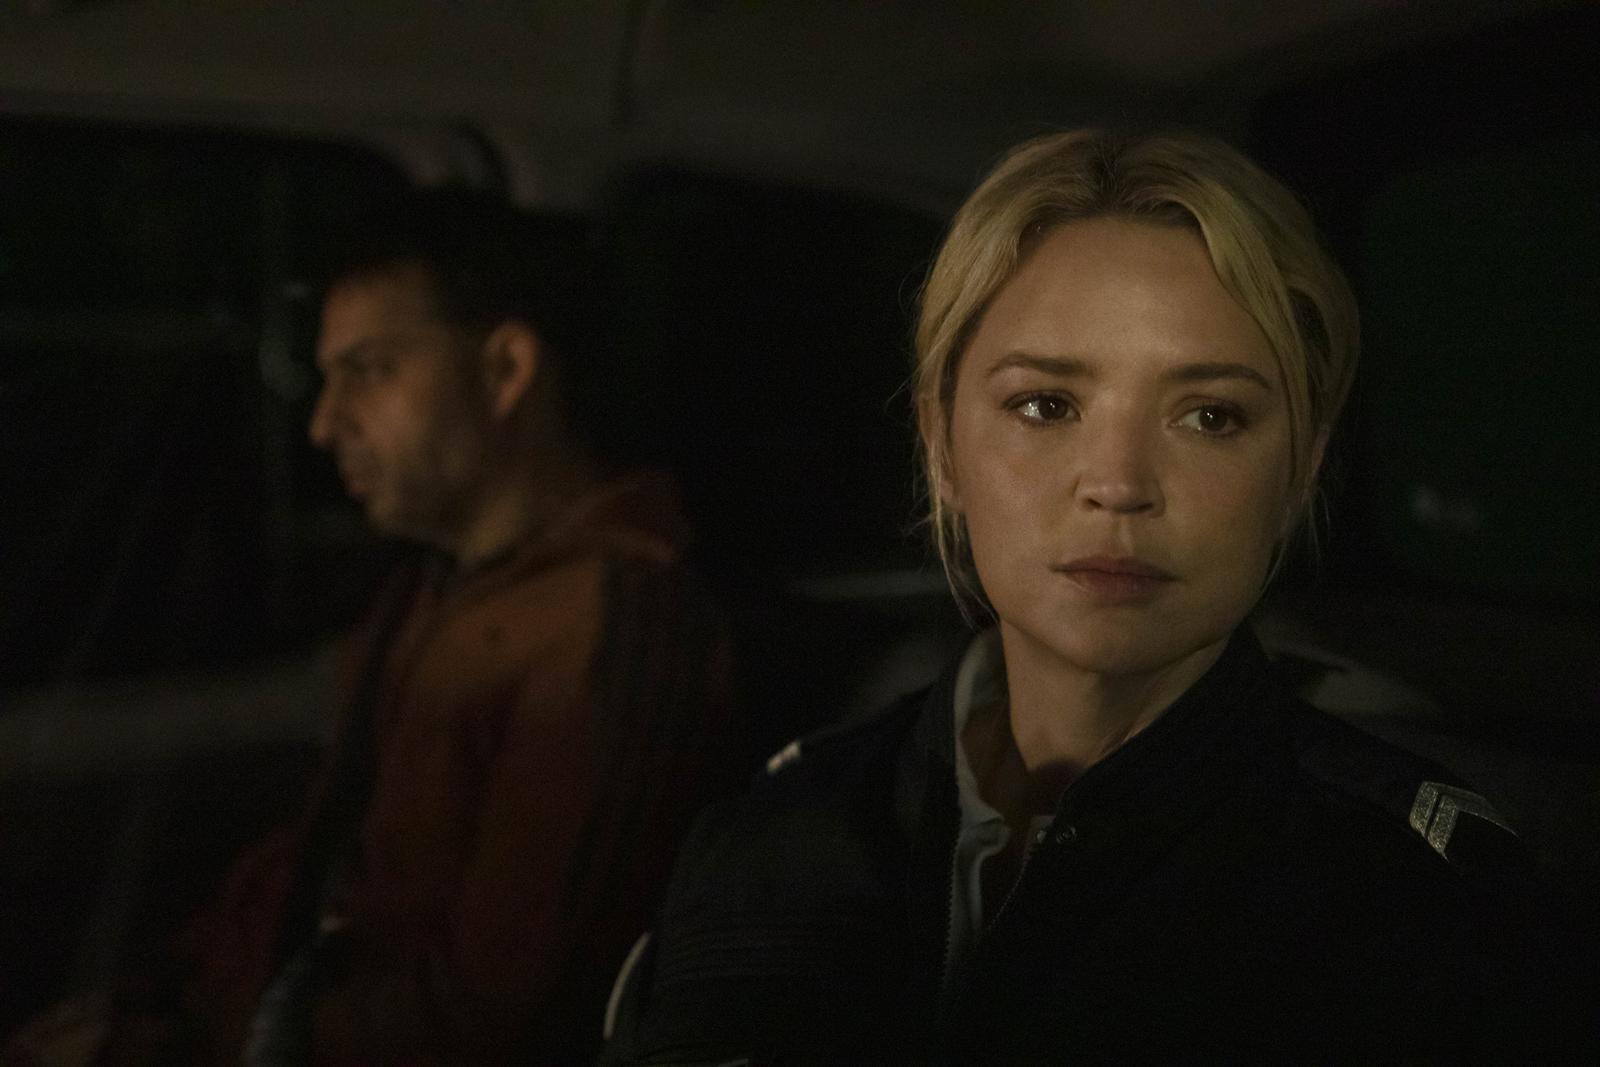 police-photo-virginie-effira-critique-avis-film-2020